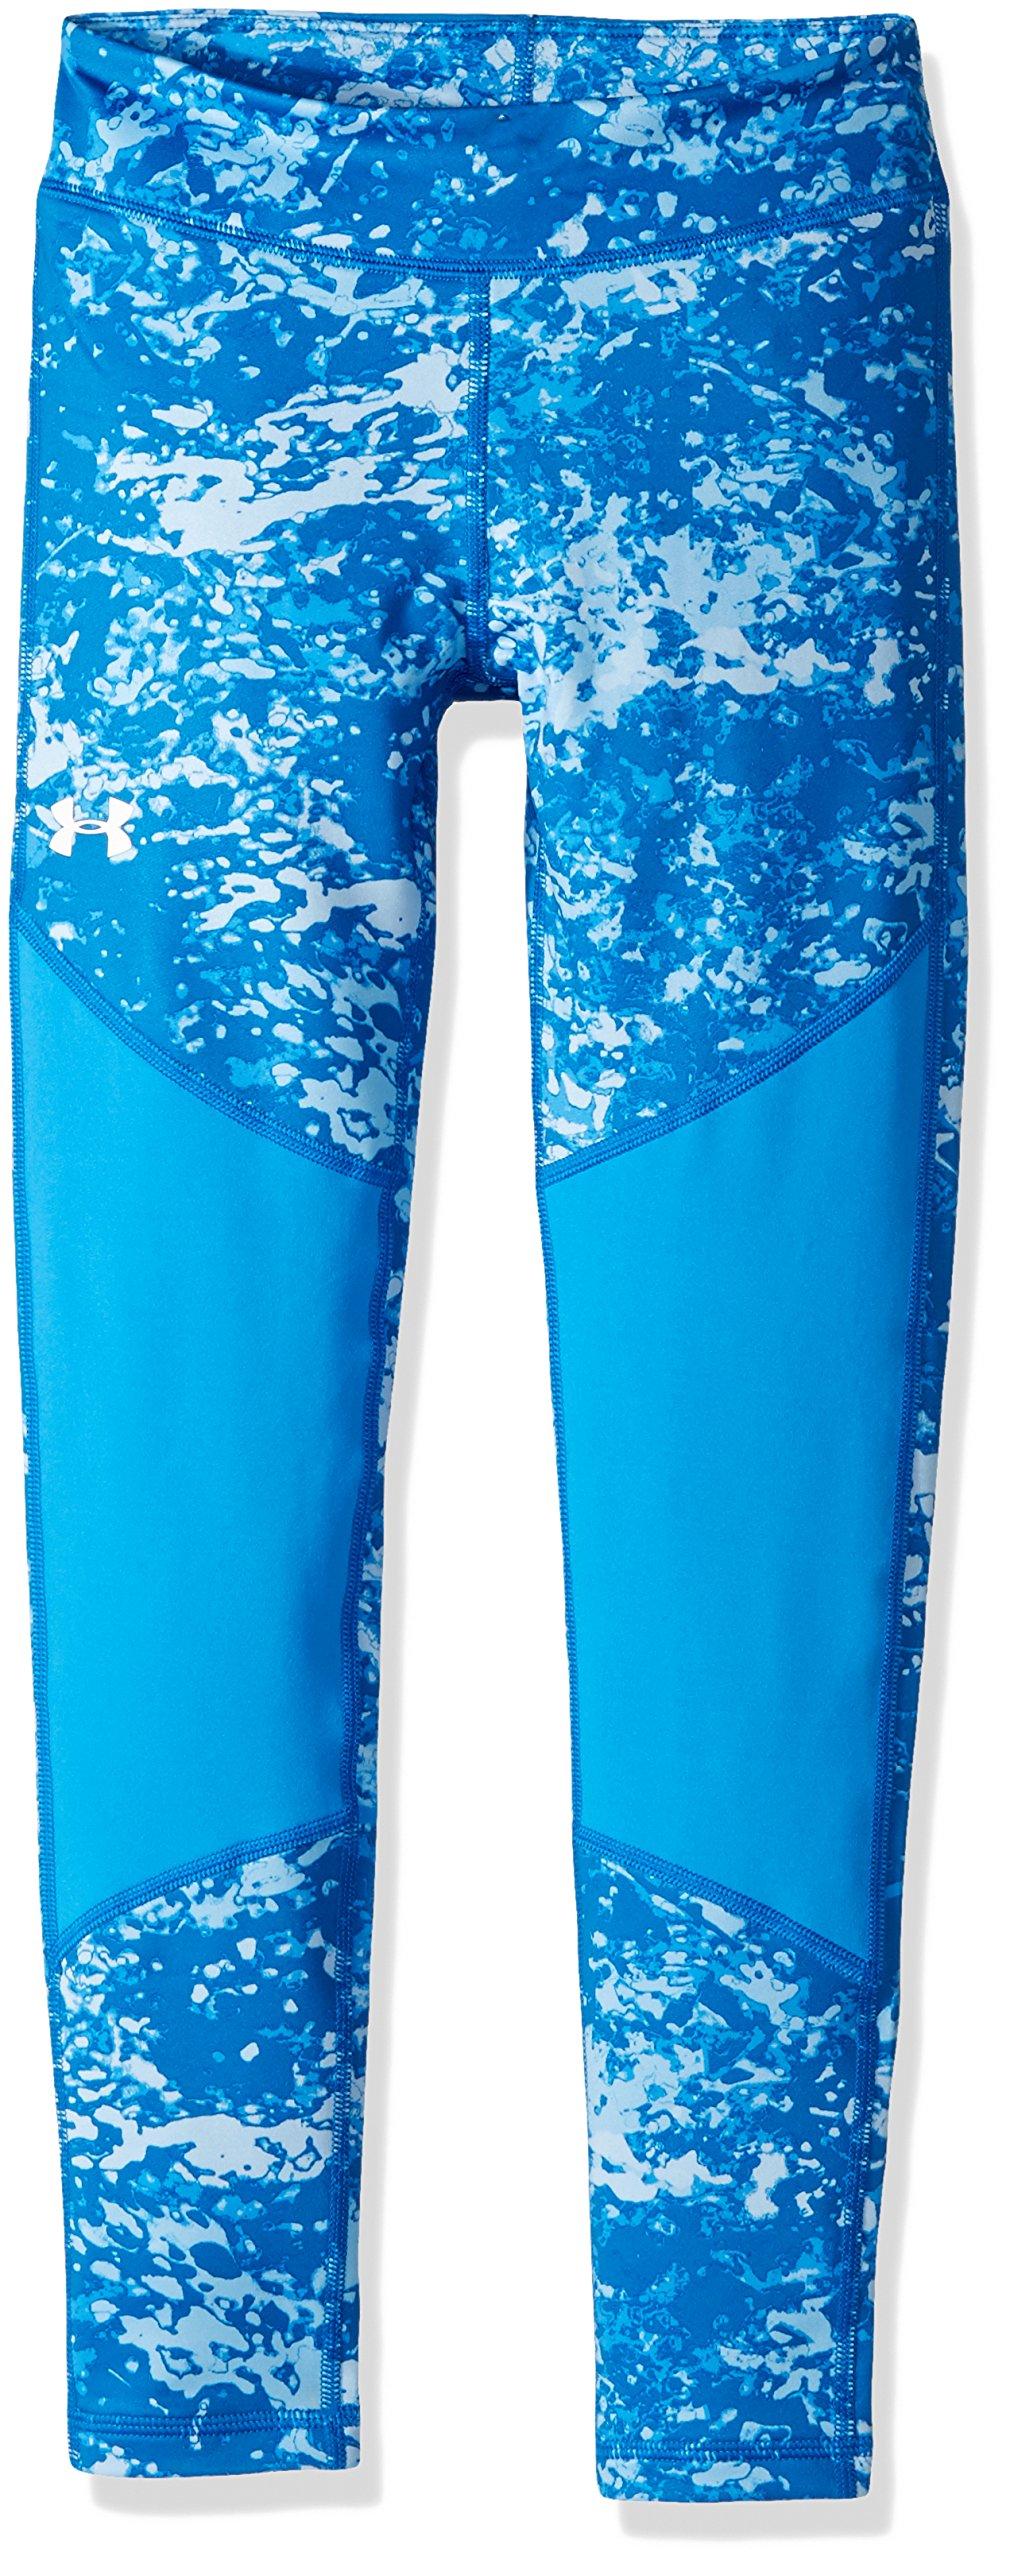 Under Armour Girls' ColdGear Novelty Leggings,Mako Blue (983)/White, Youth Large